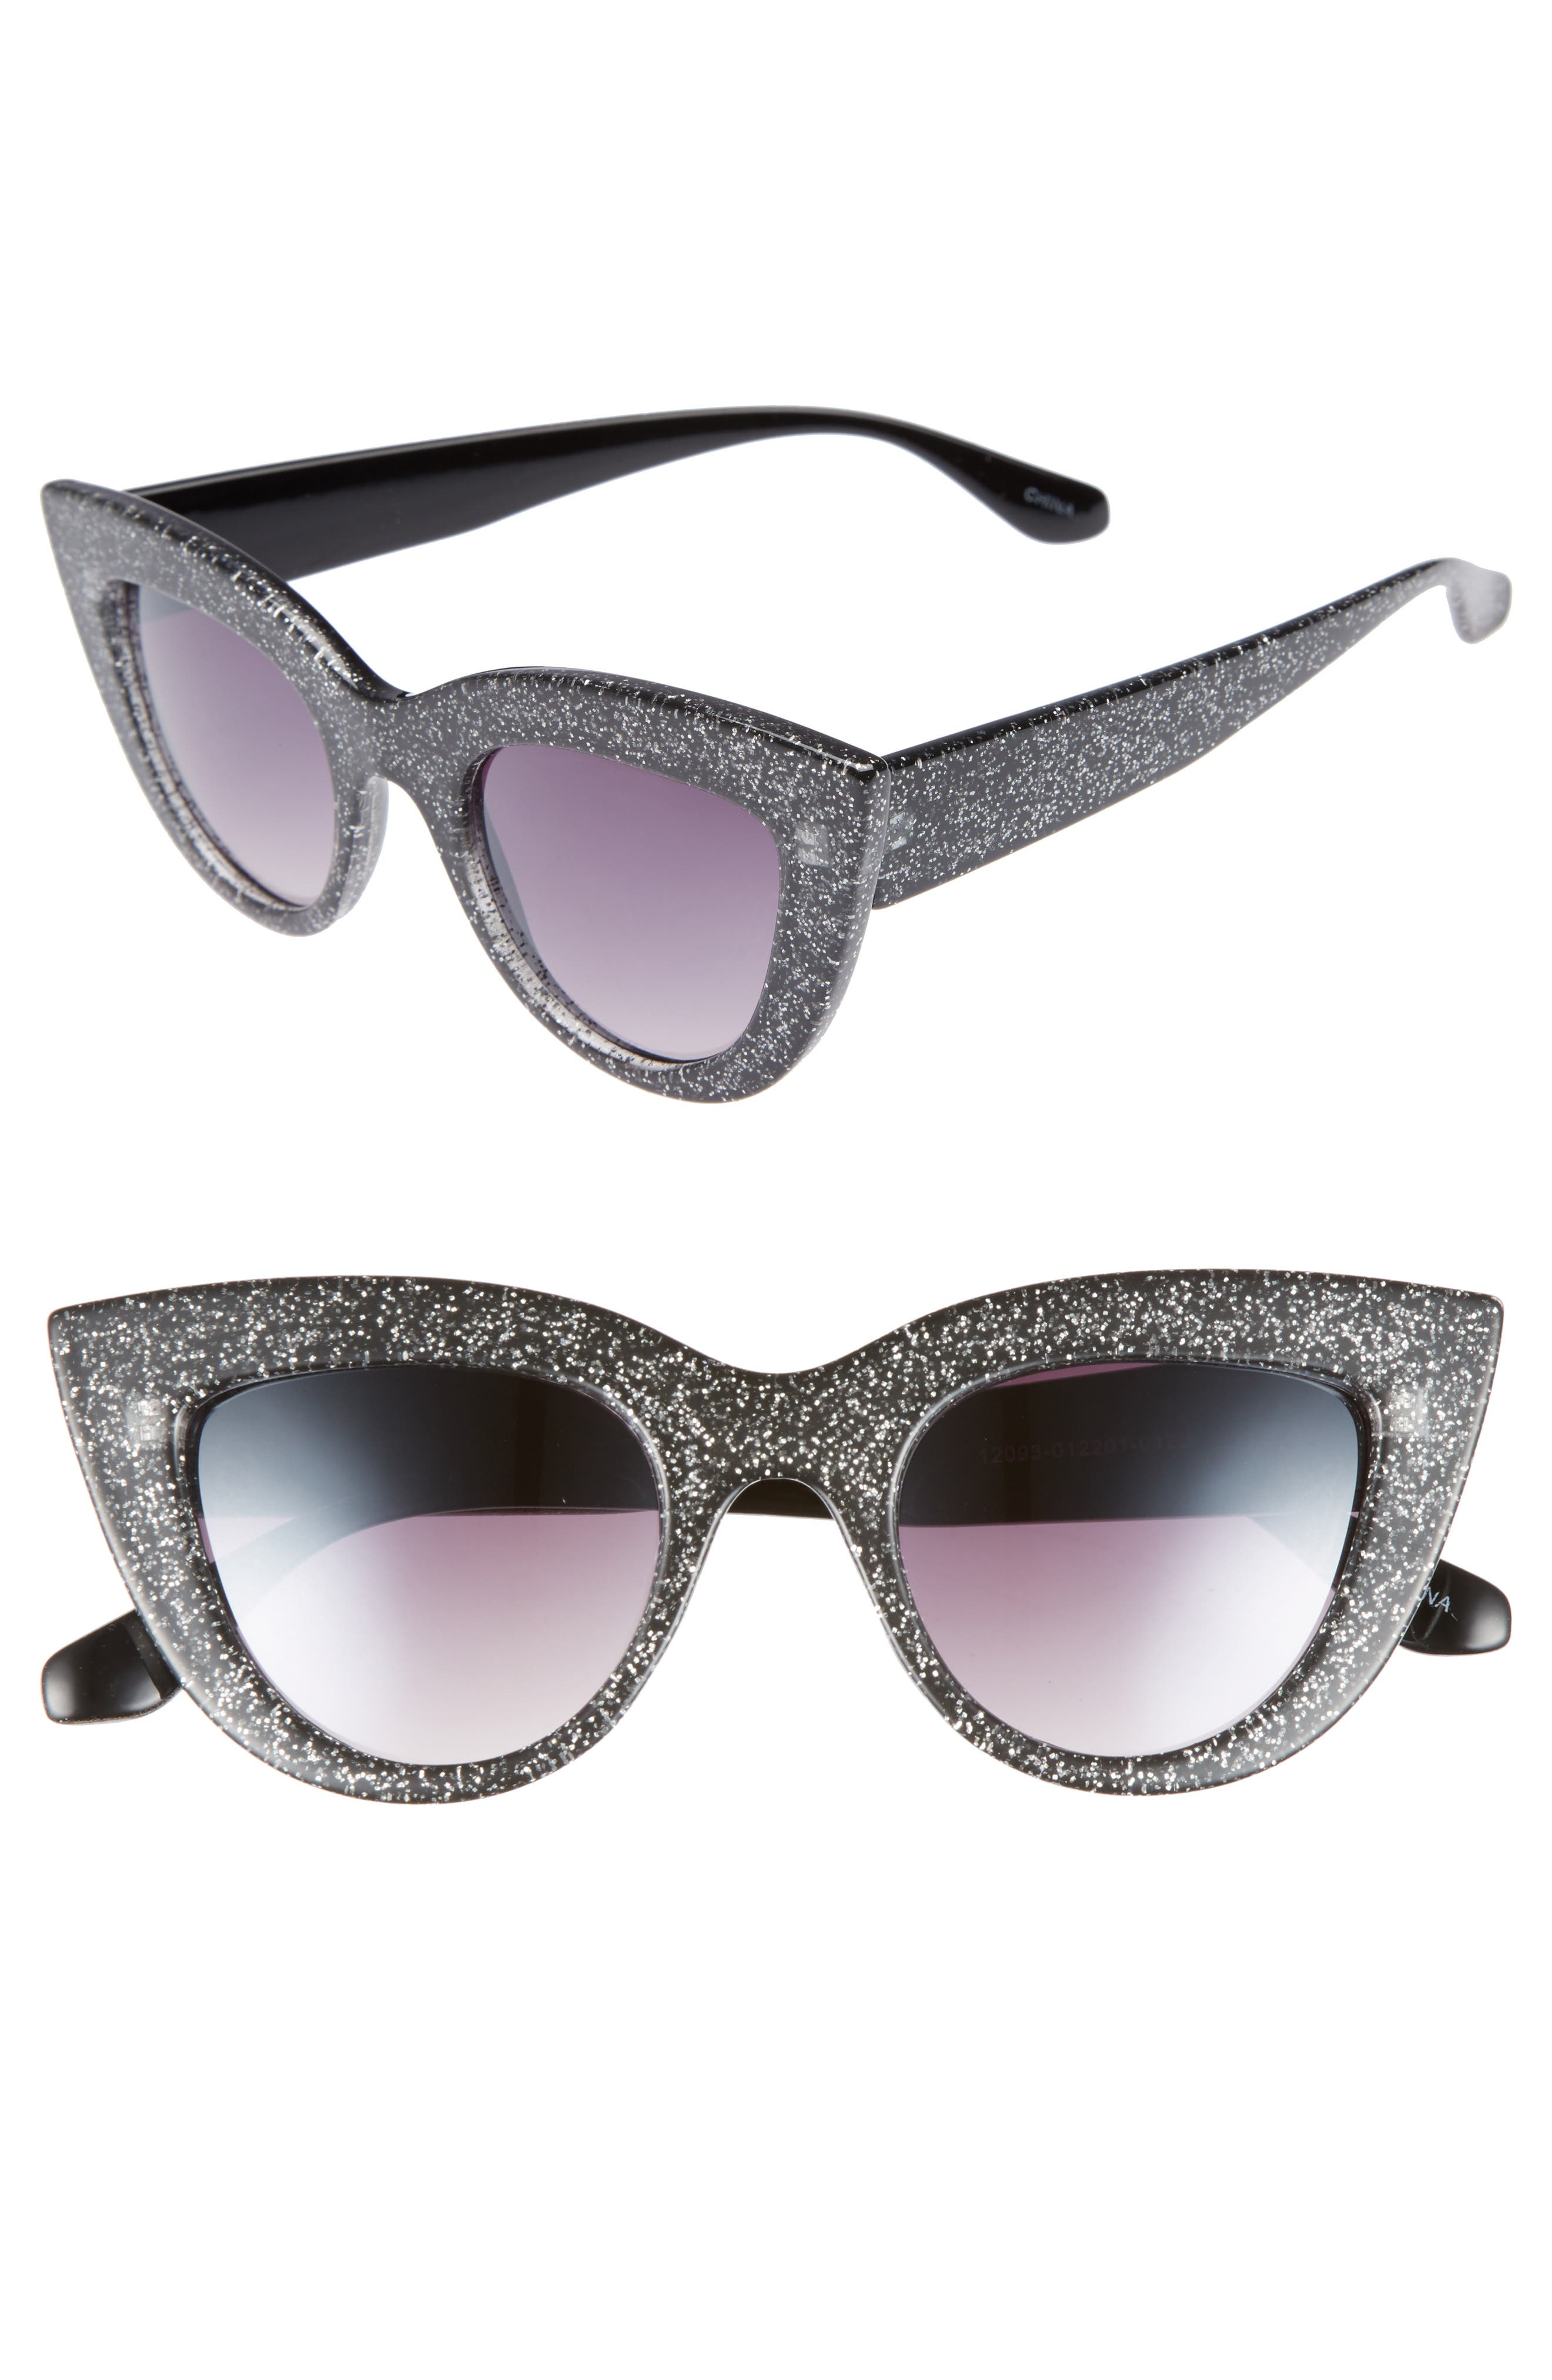 45mm Glitter Cat Eye Sunglasses,                             Main thumbnail 1, color,                             001